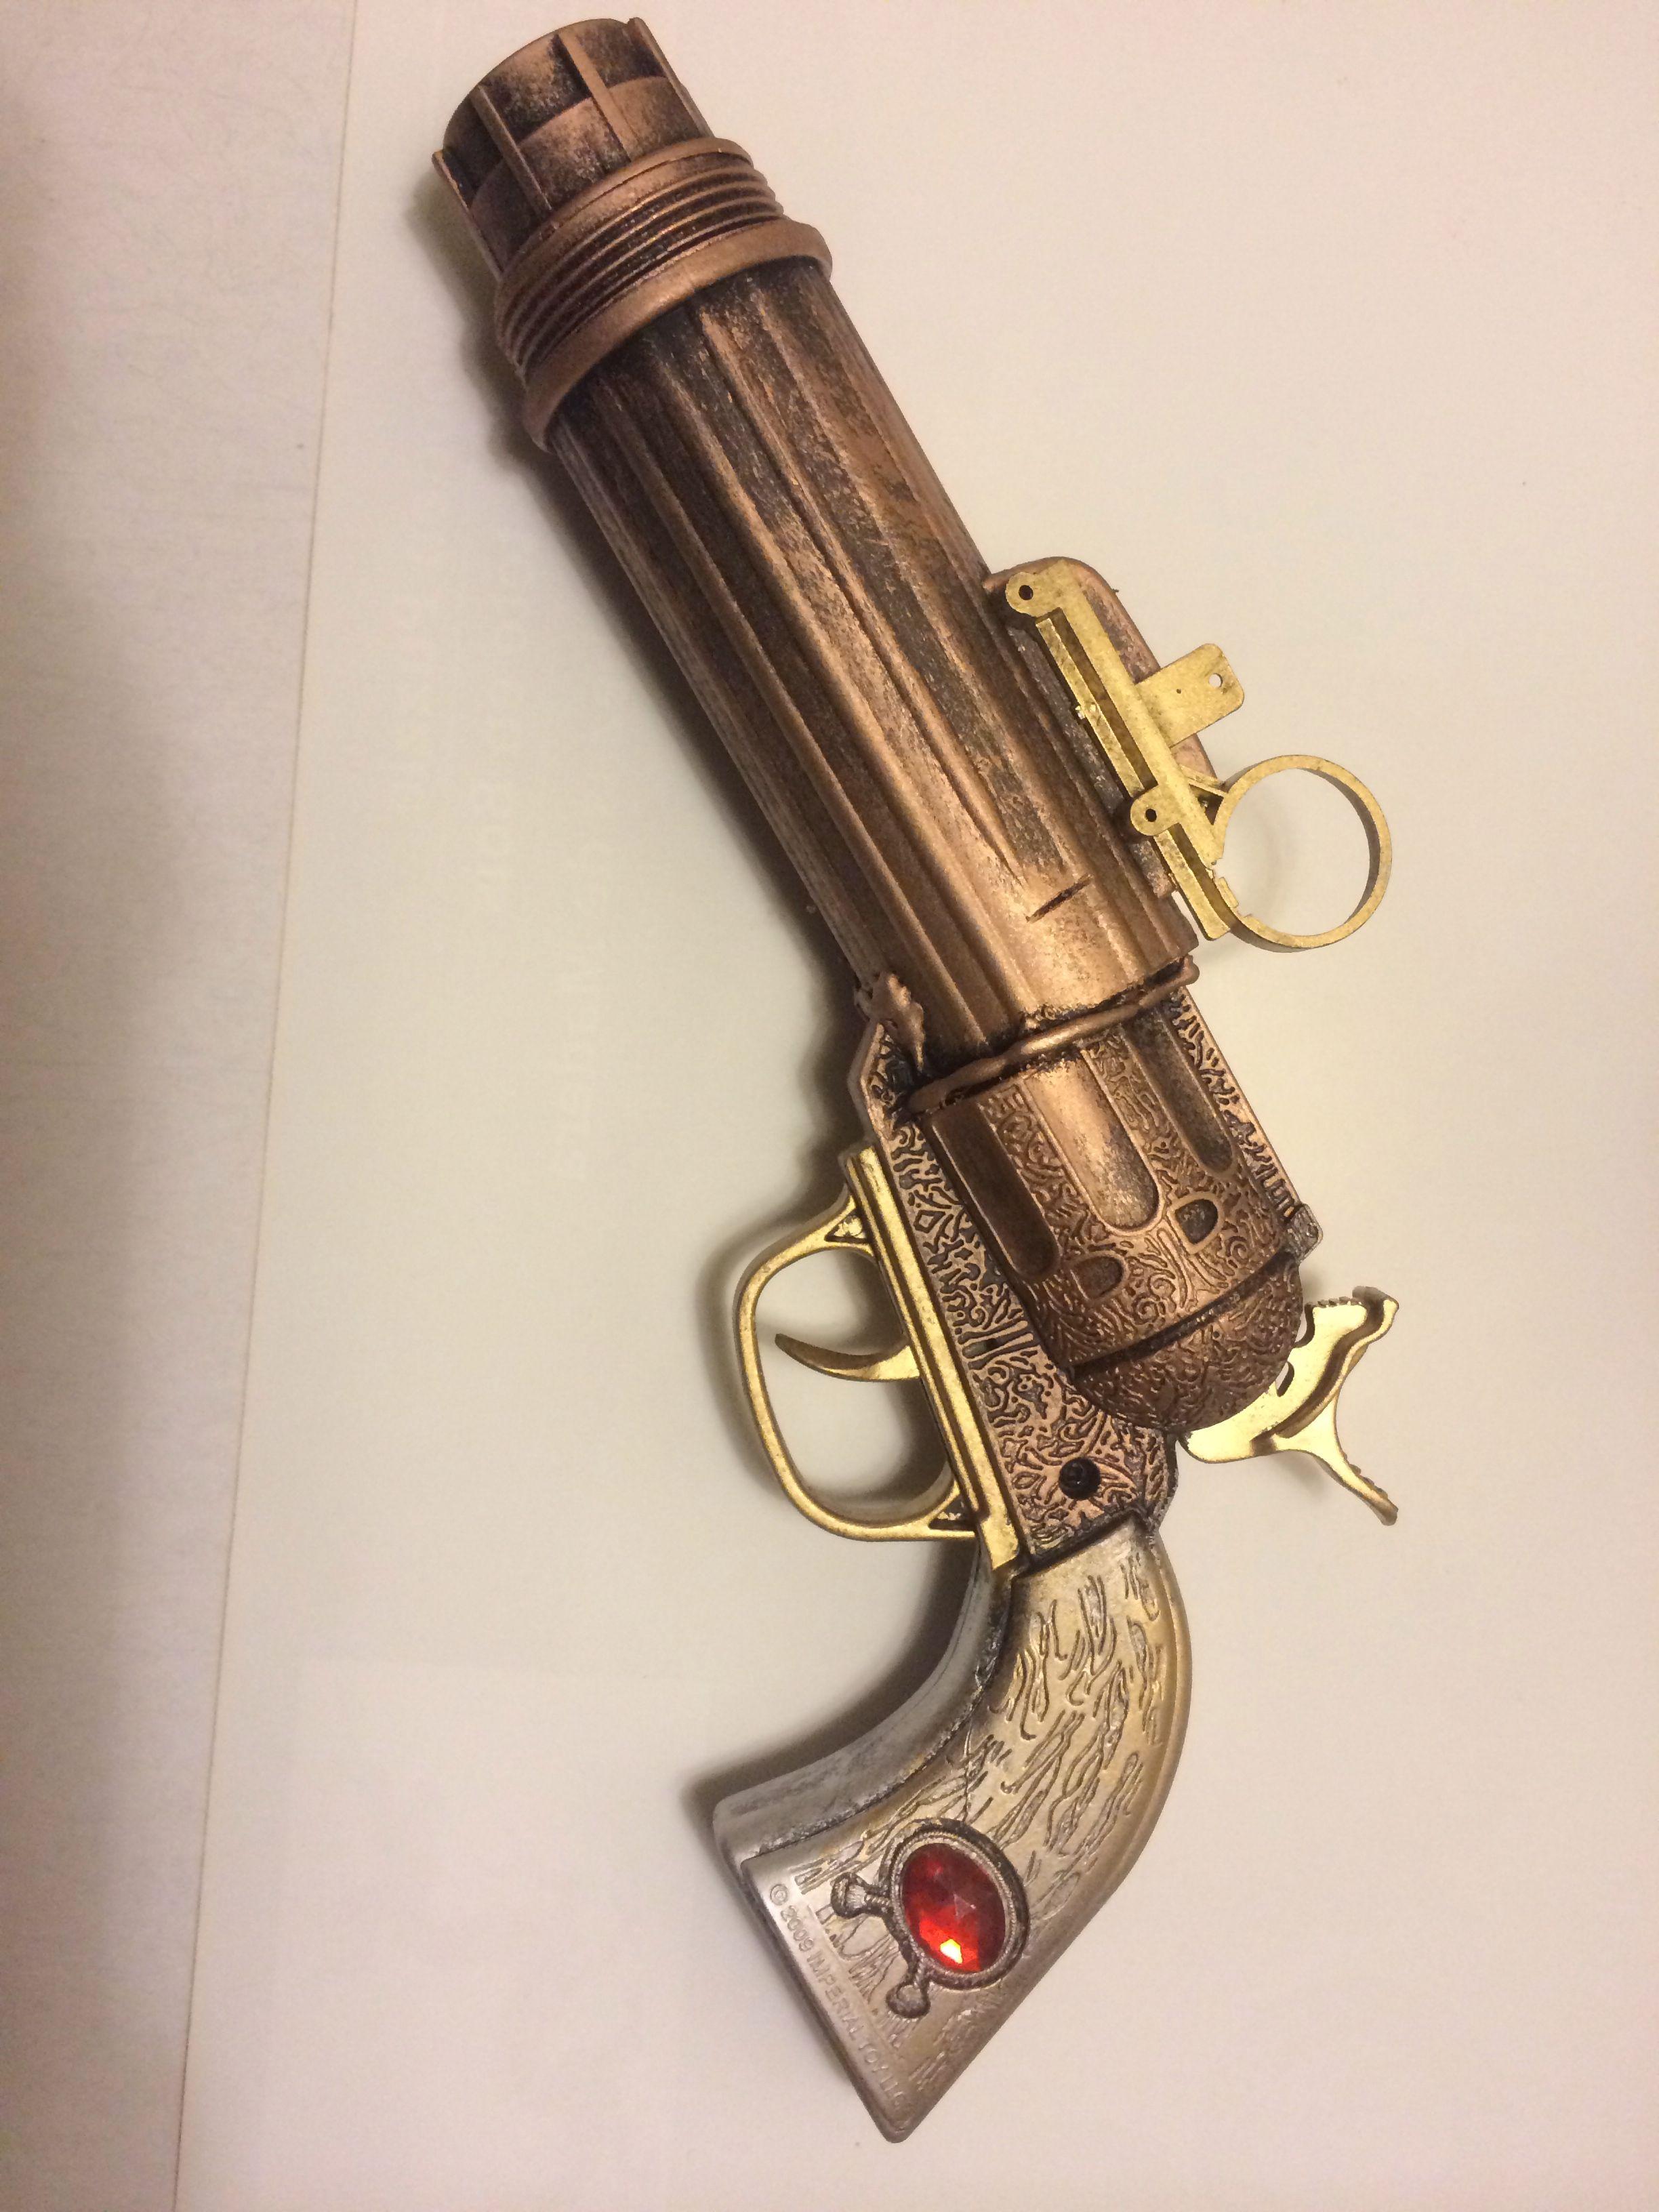 Plastic cap gun steampunk'd  Random flashlight parts and toy truck